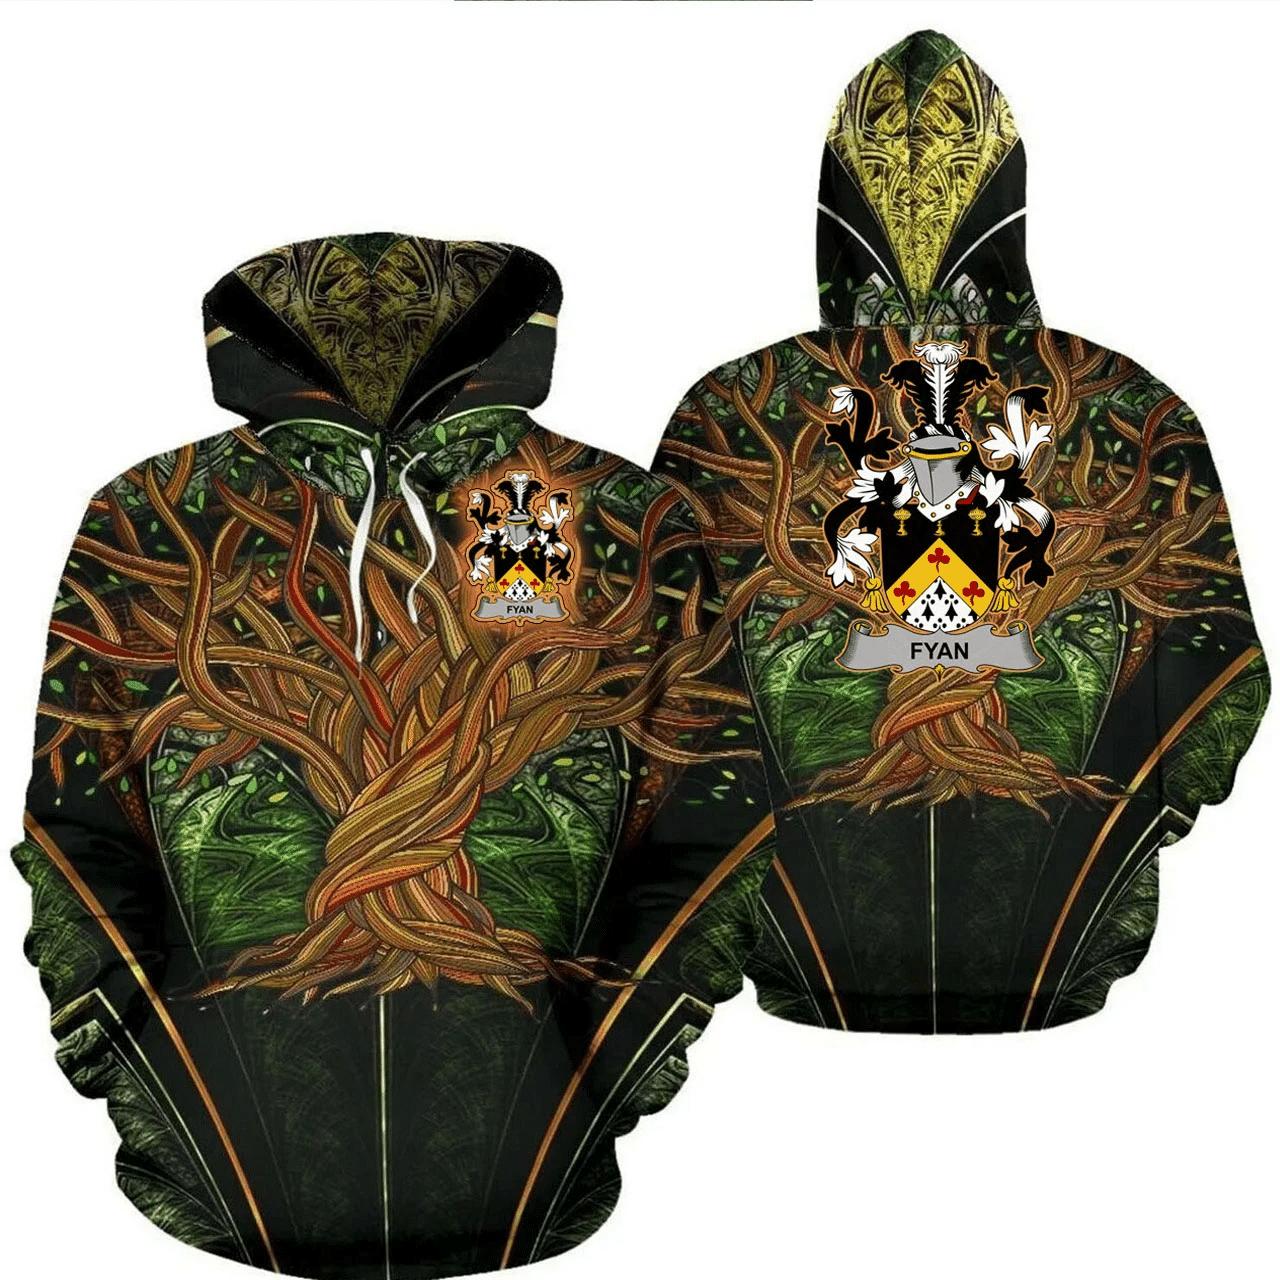 1stIreland Ireland Hoodie - Fyan or Faghan Irish Family Crest Hoodie - Tree Of Life A7